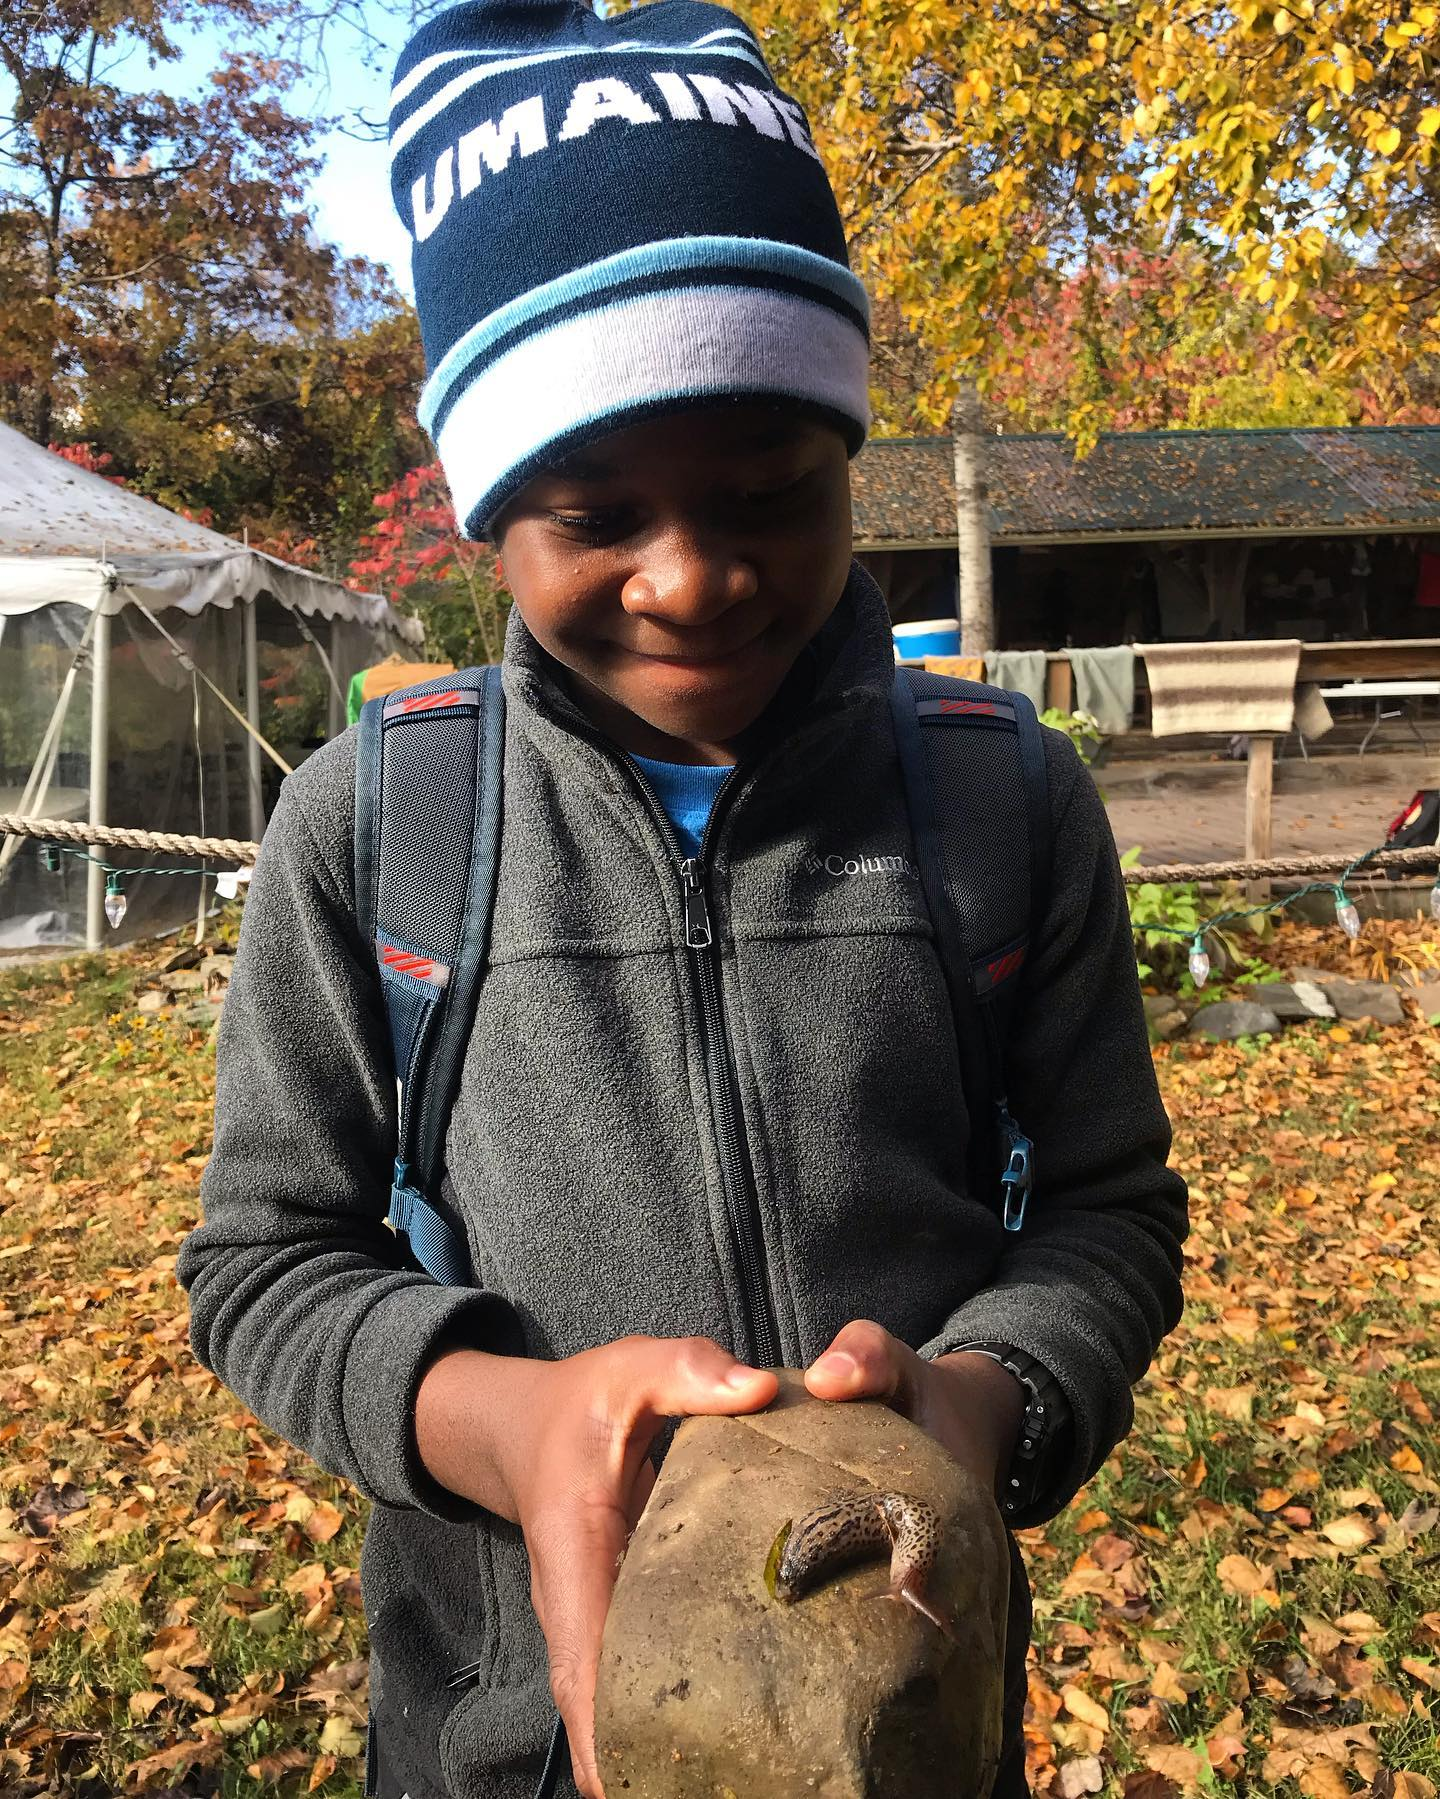 a young boy holds a rock with a slug on it